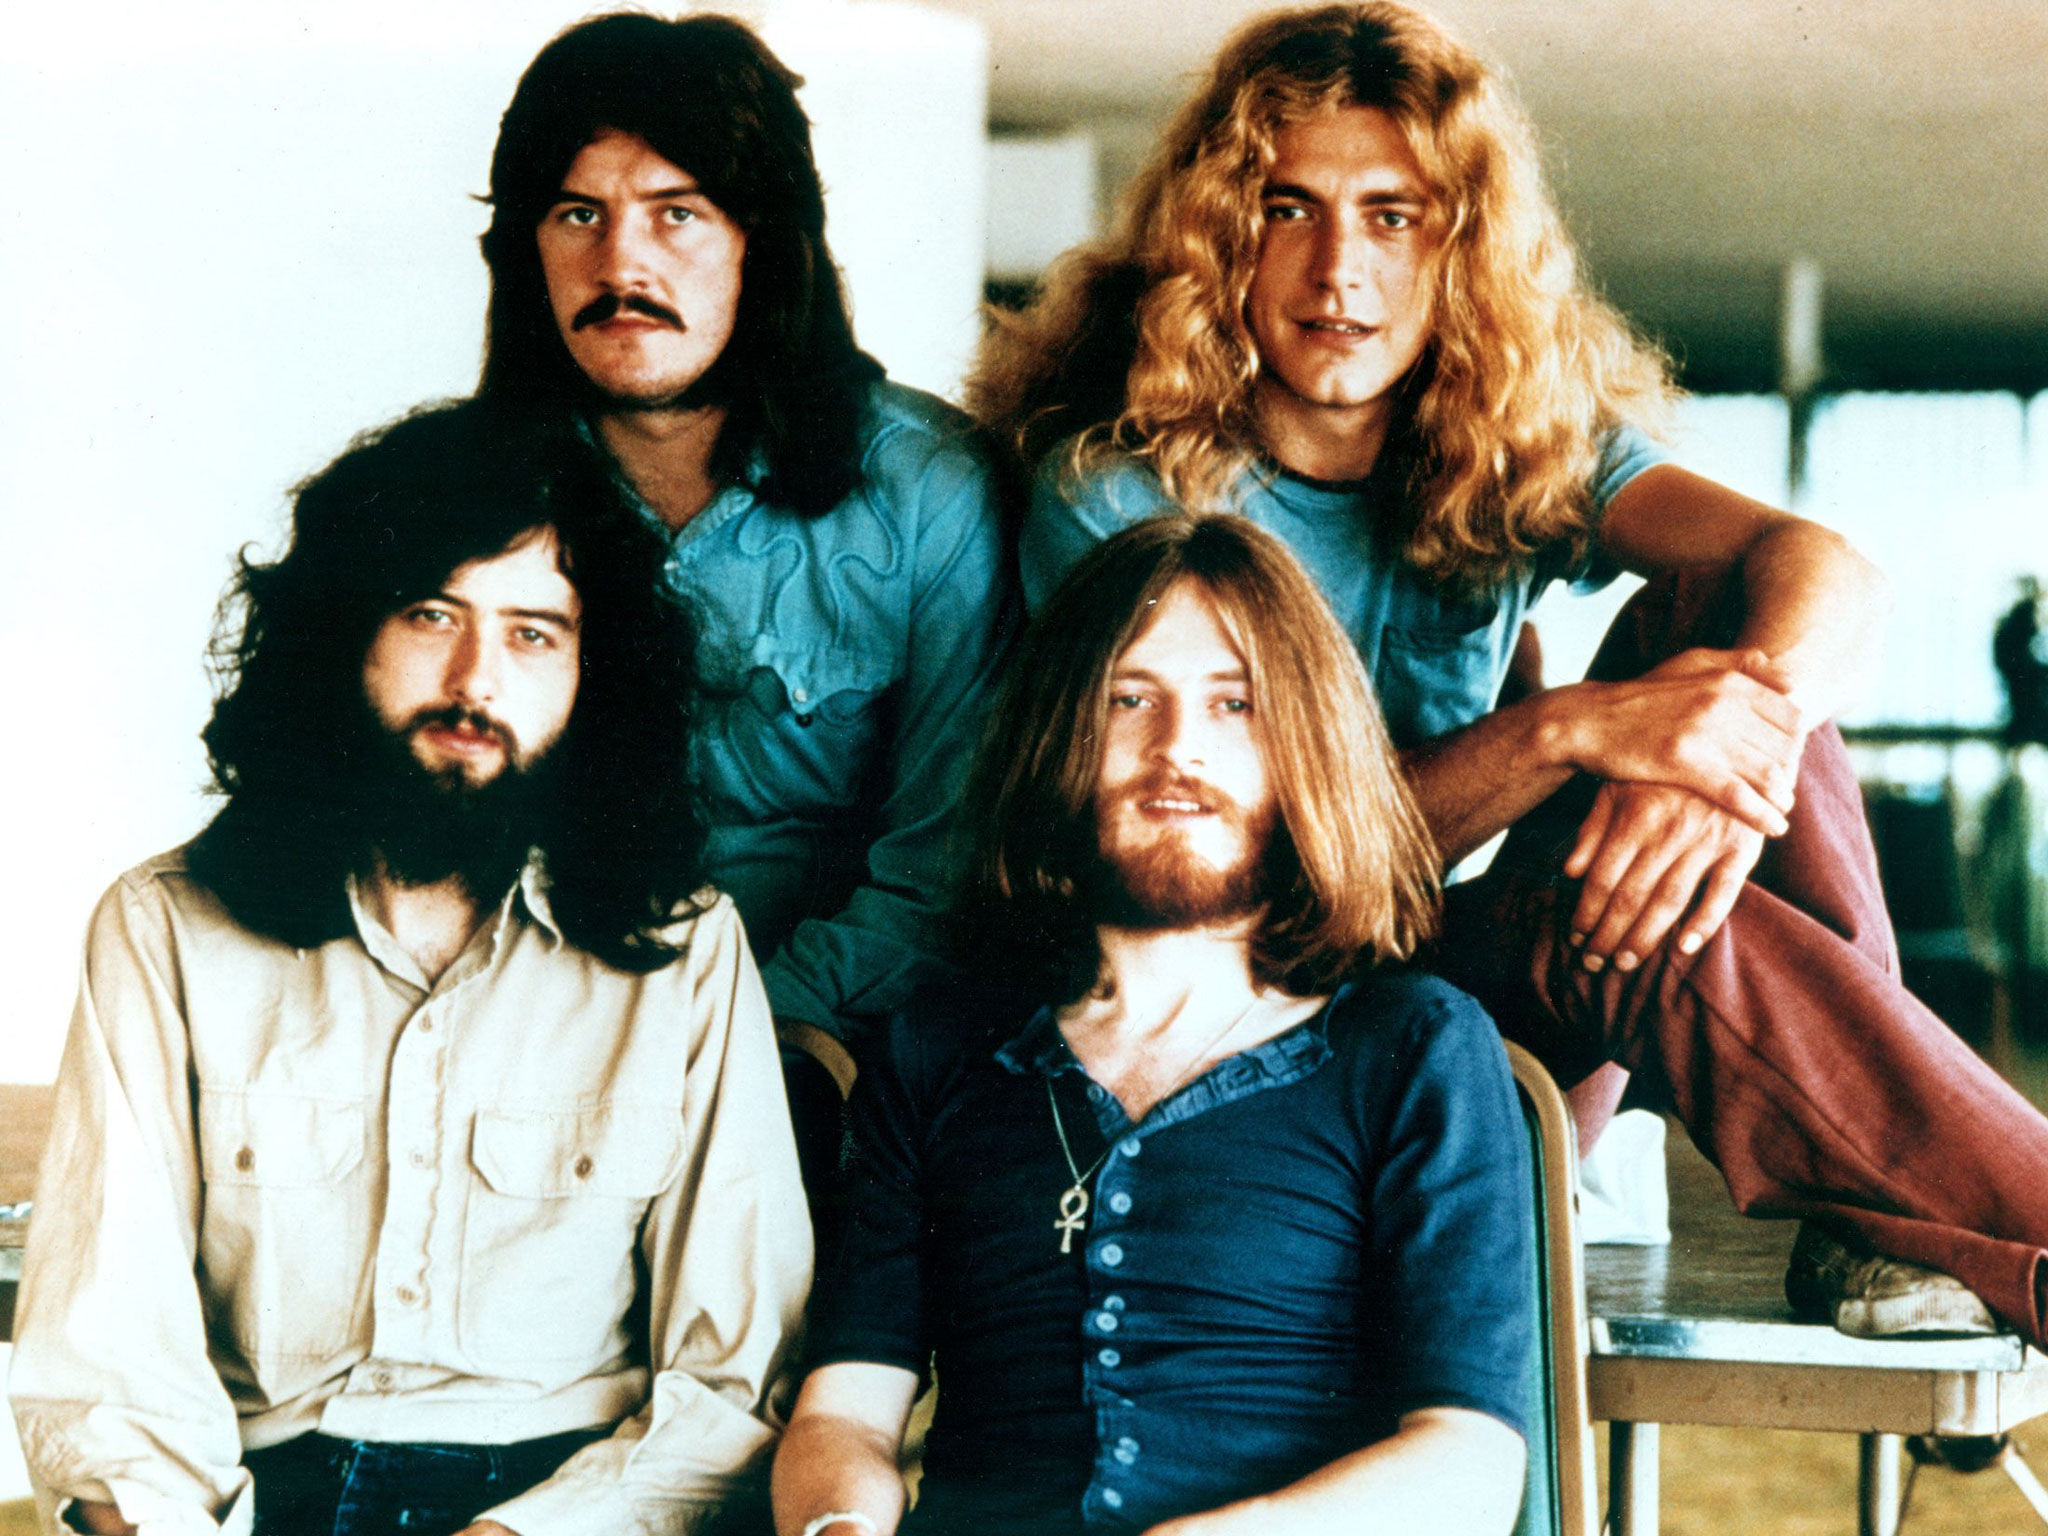 ¿Qué integrante de Led Zeppelin falleció prematuramente?